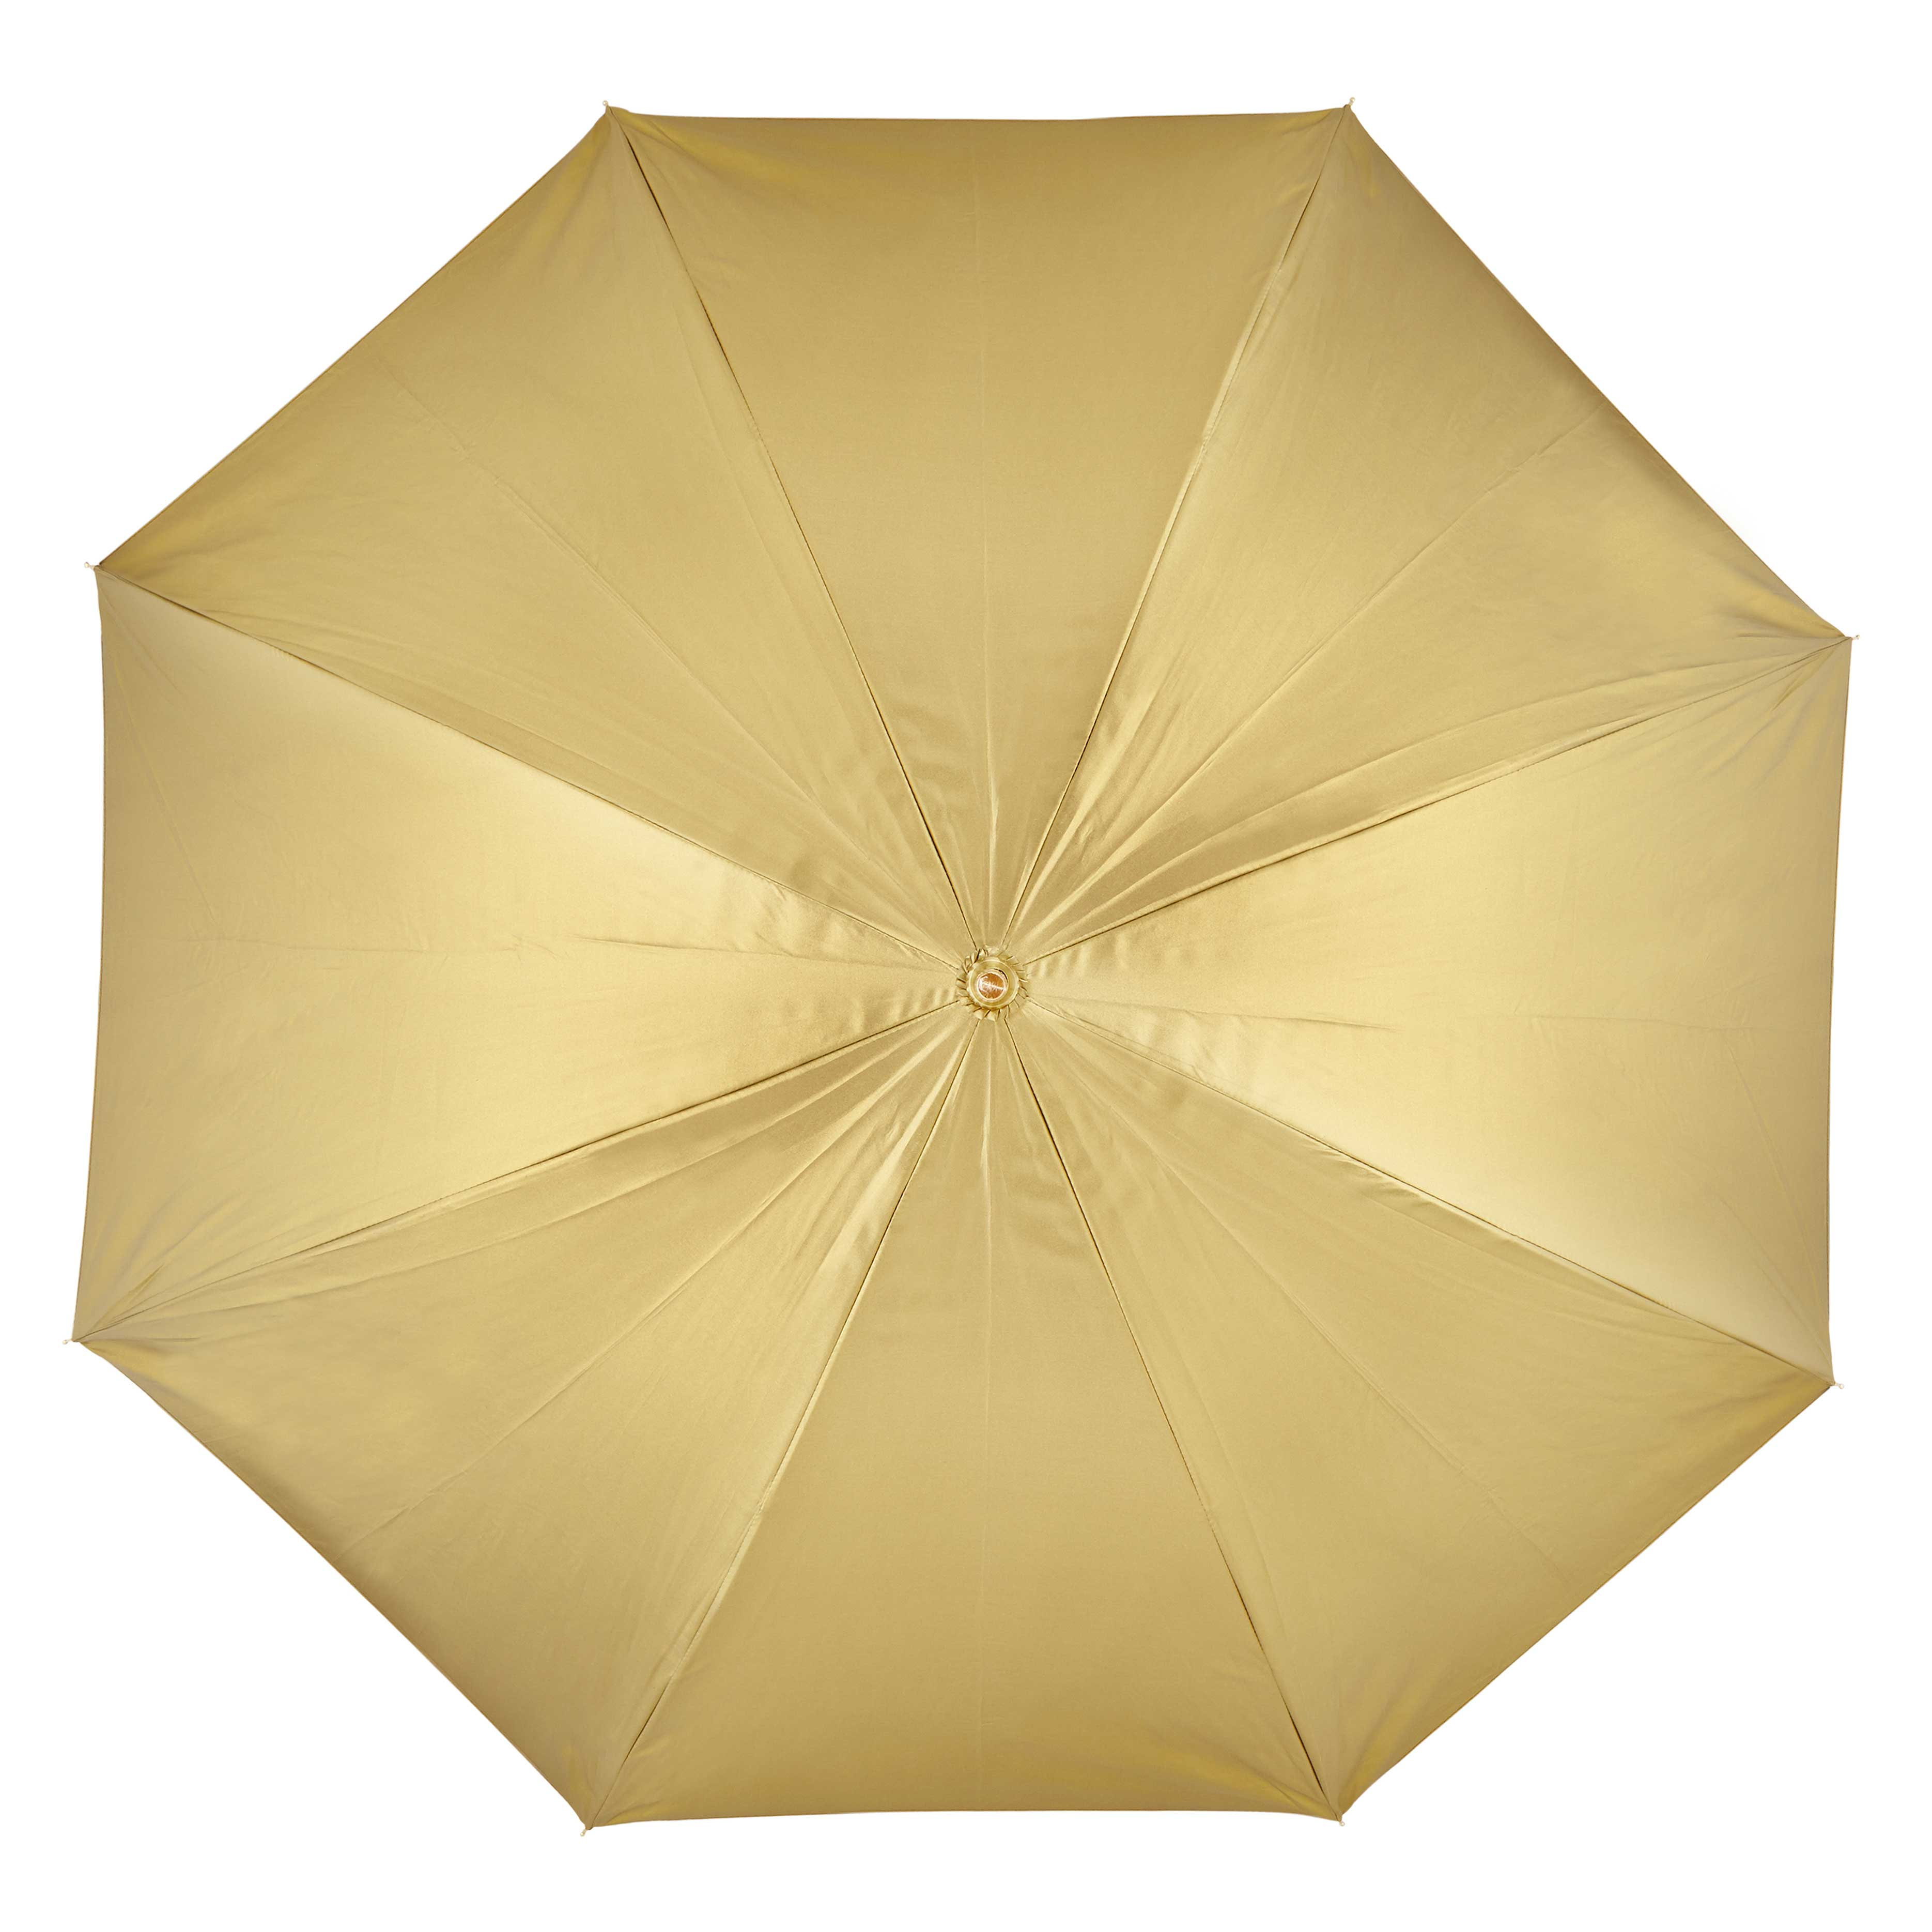 crimson heart umbrella heart shaped umbrella rain gear